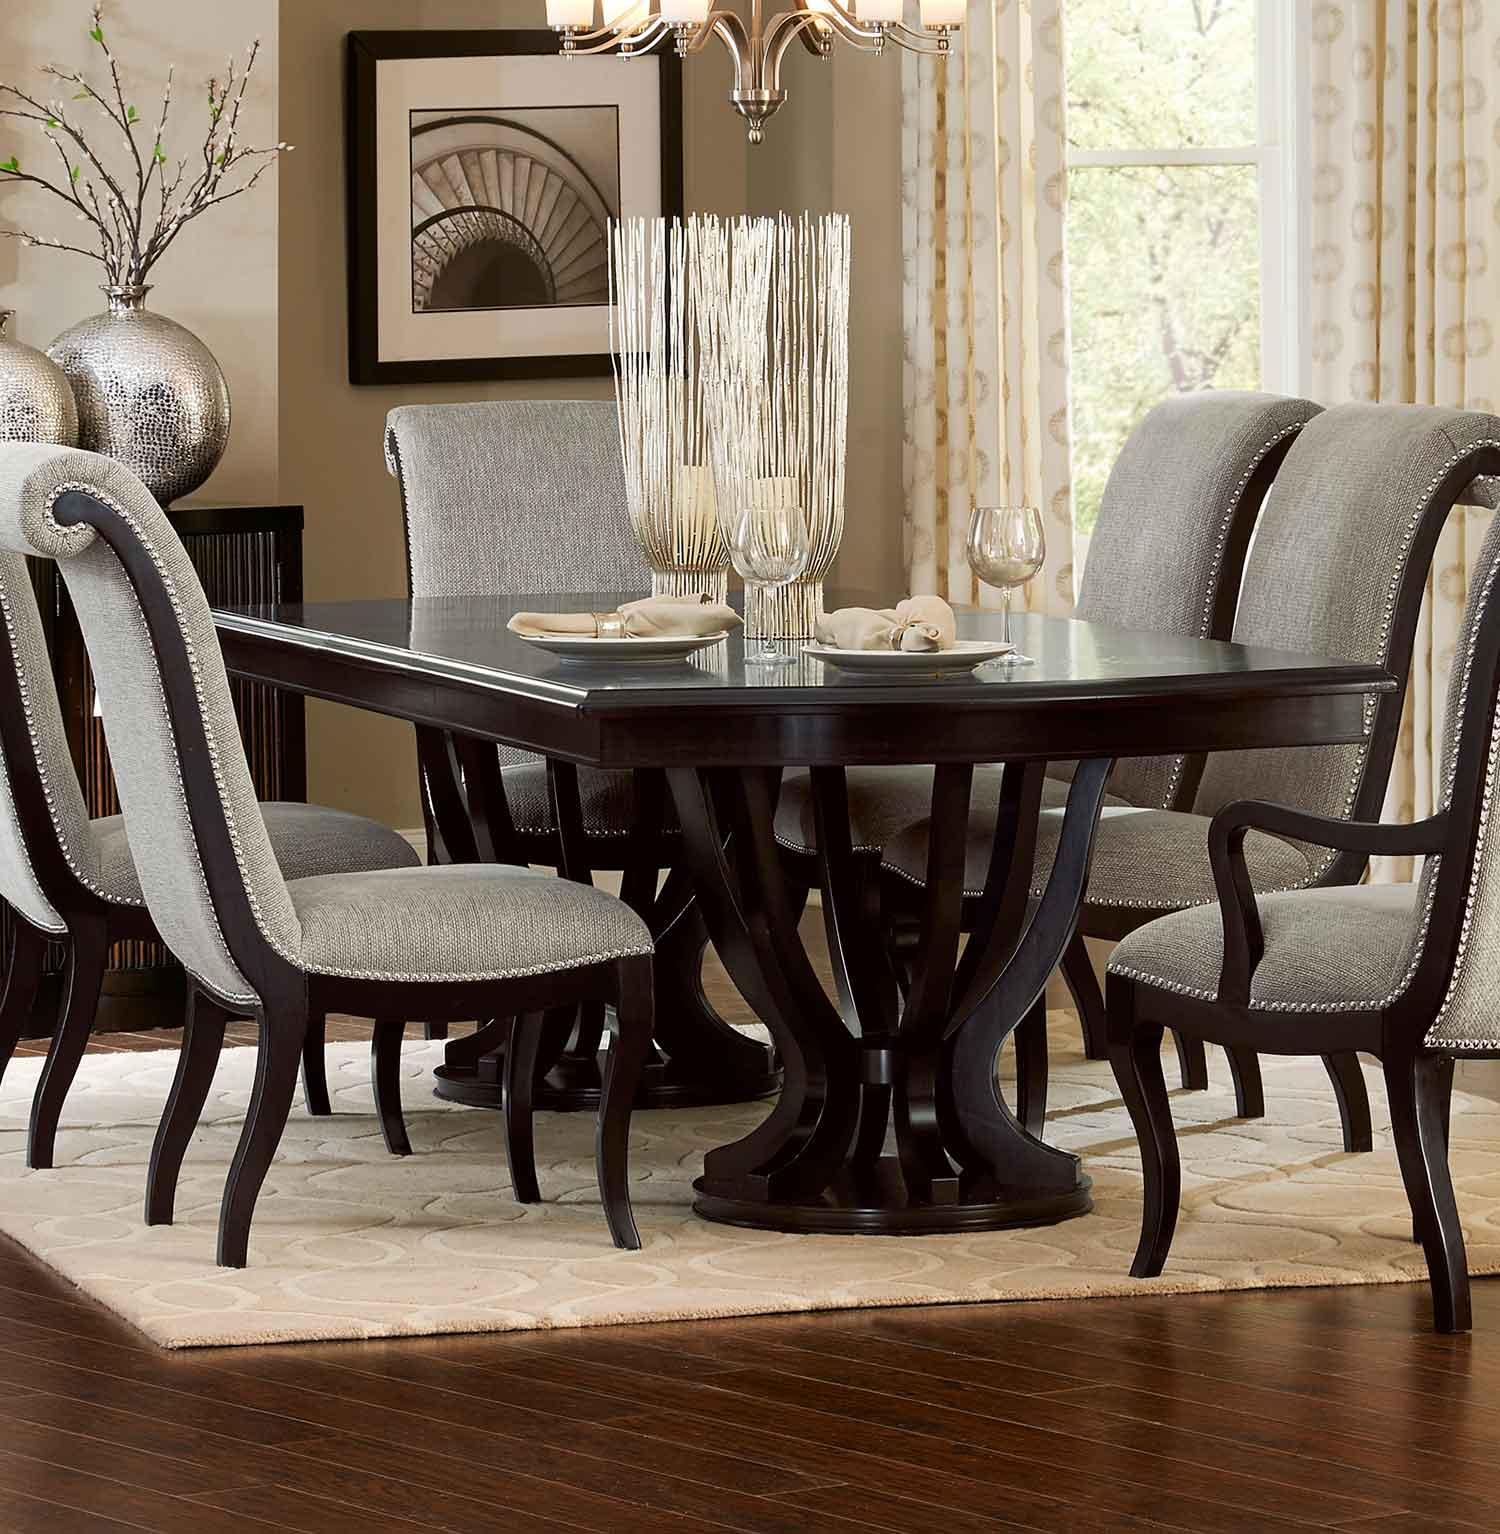 Homelegance Savion Double Pedestal Dining Table with Leaf - Espresso